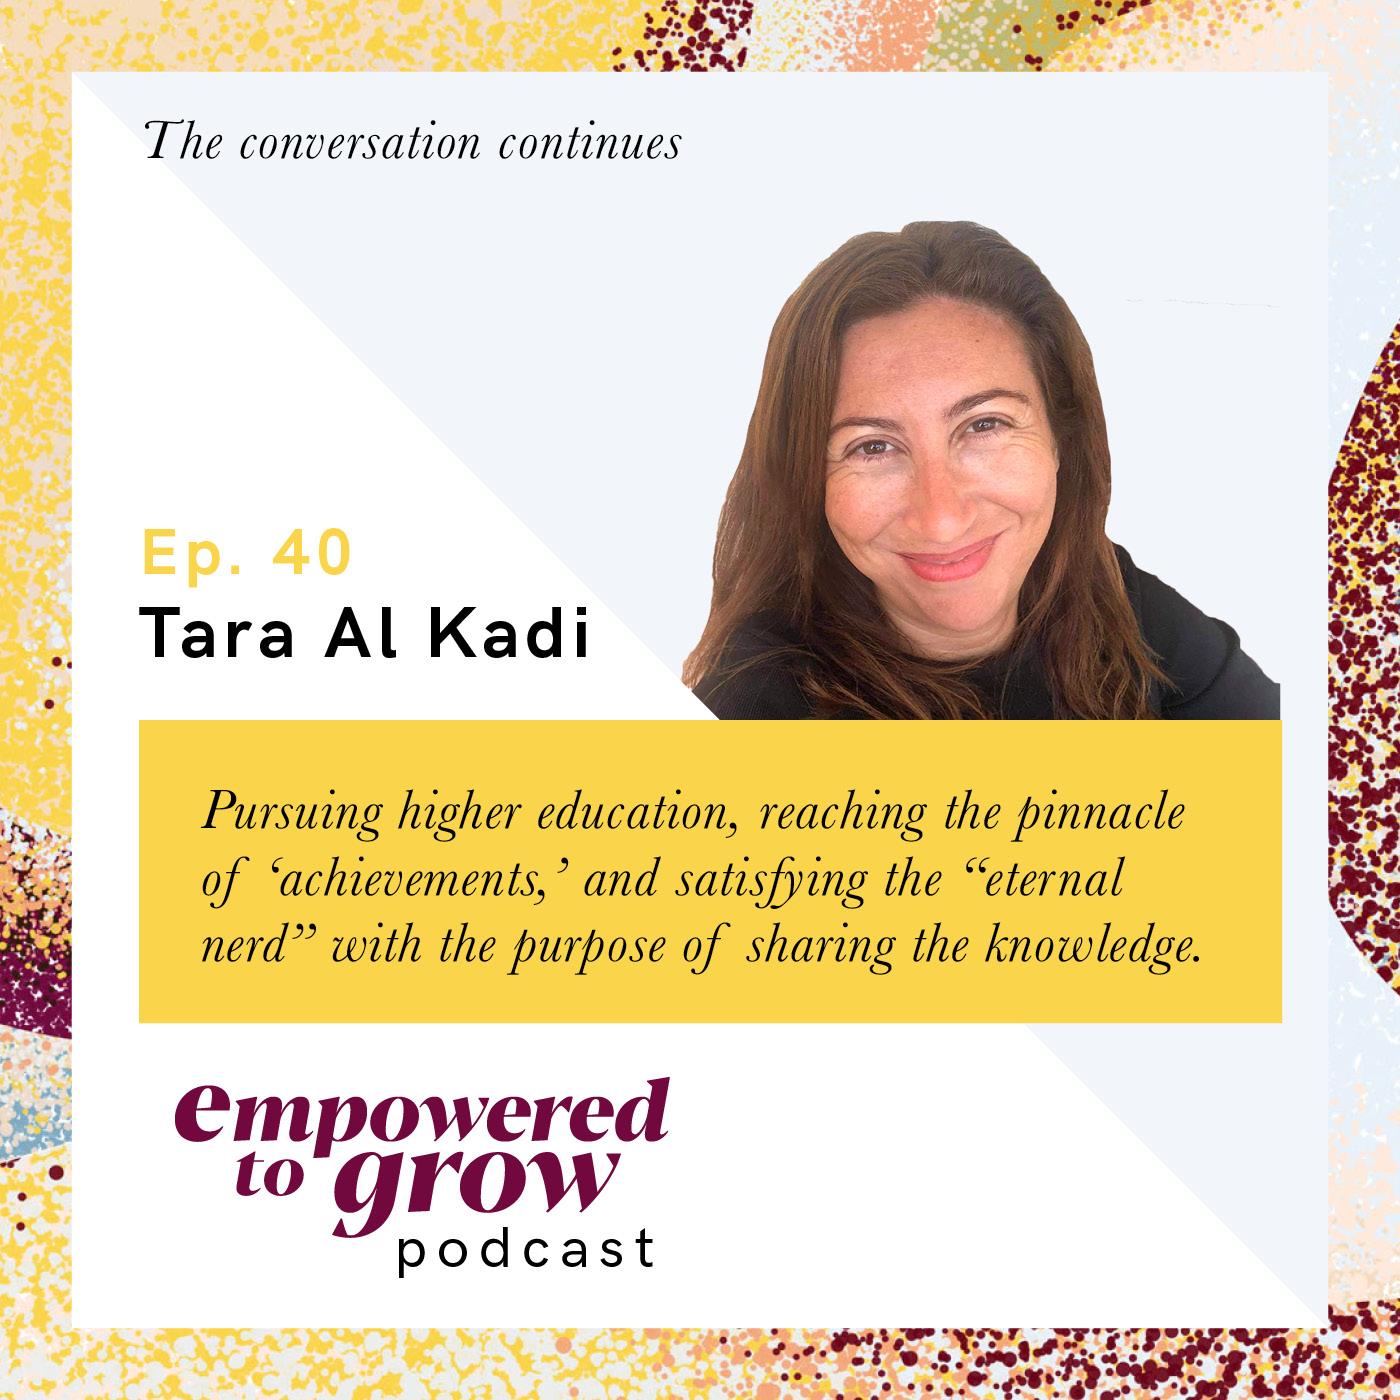 Ep. 40 – Unchartered Discussions – Tara Al Kadi